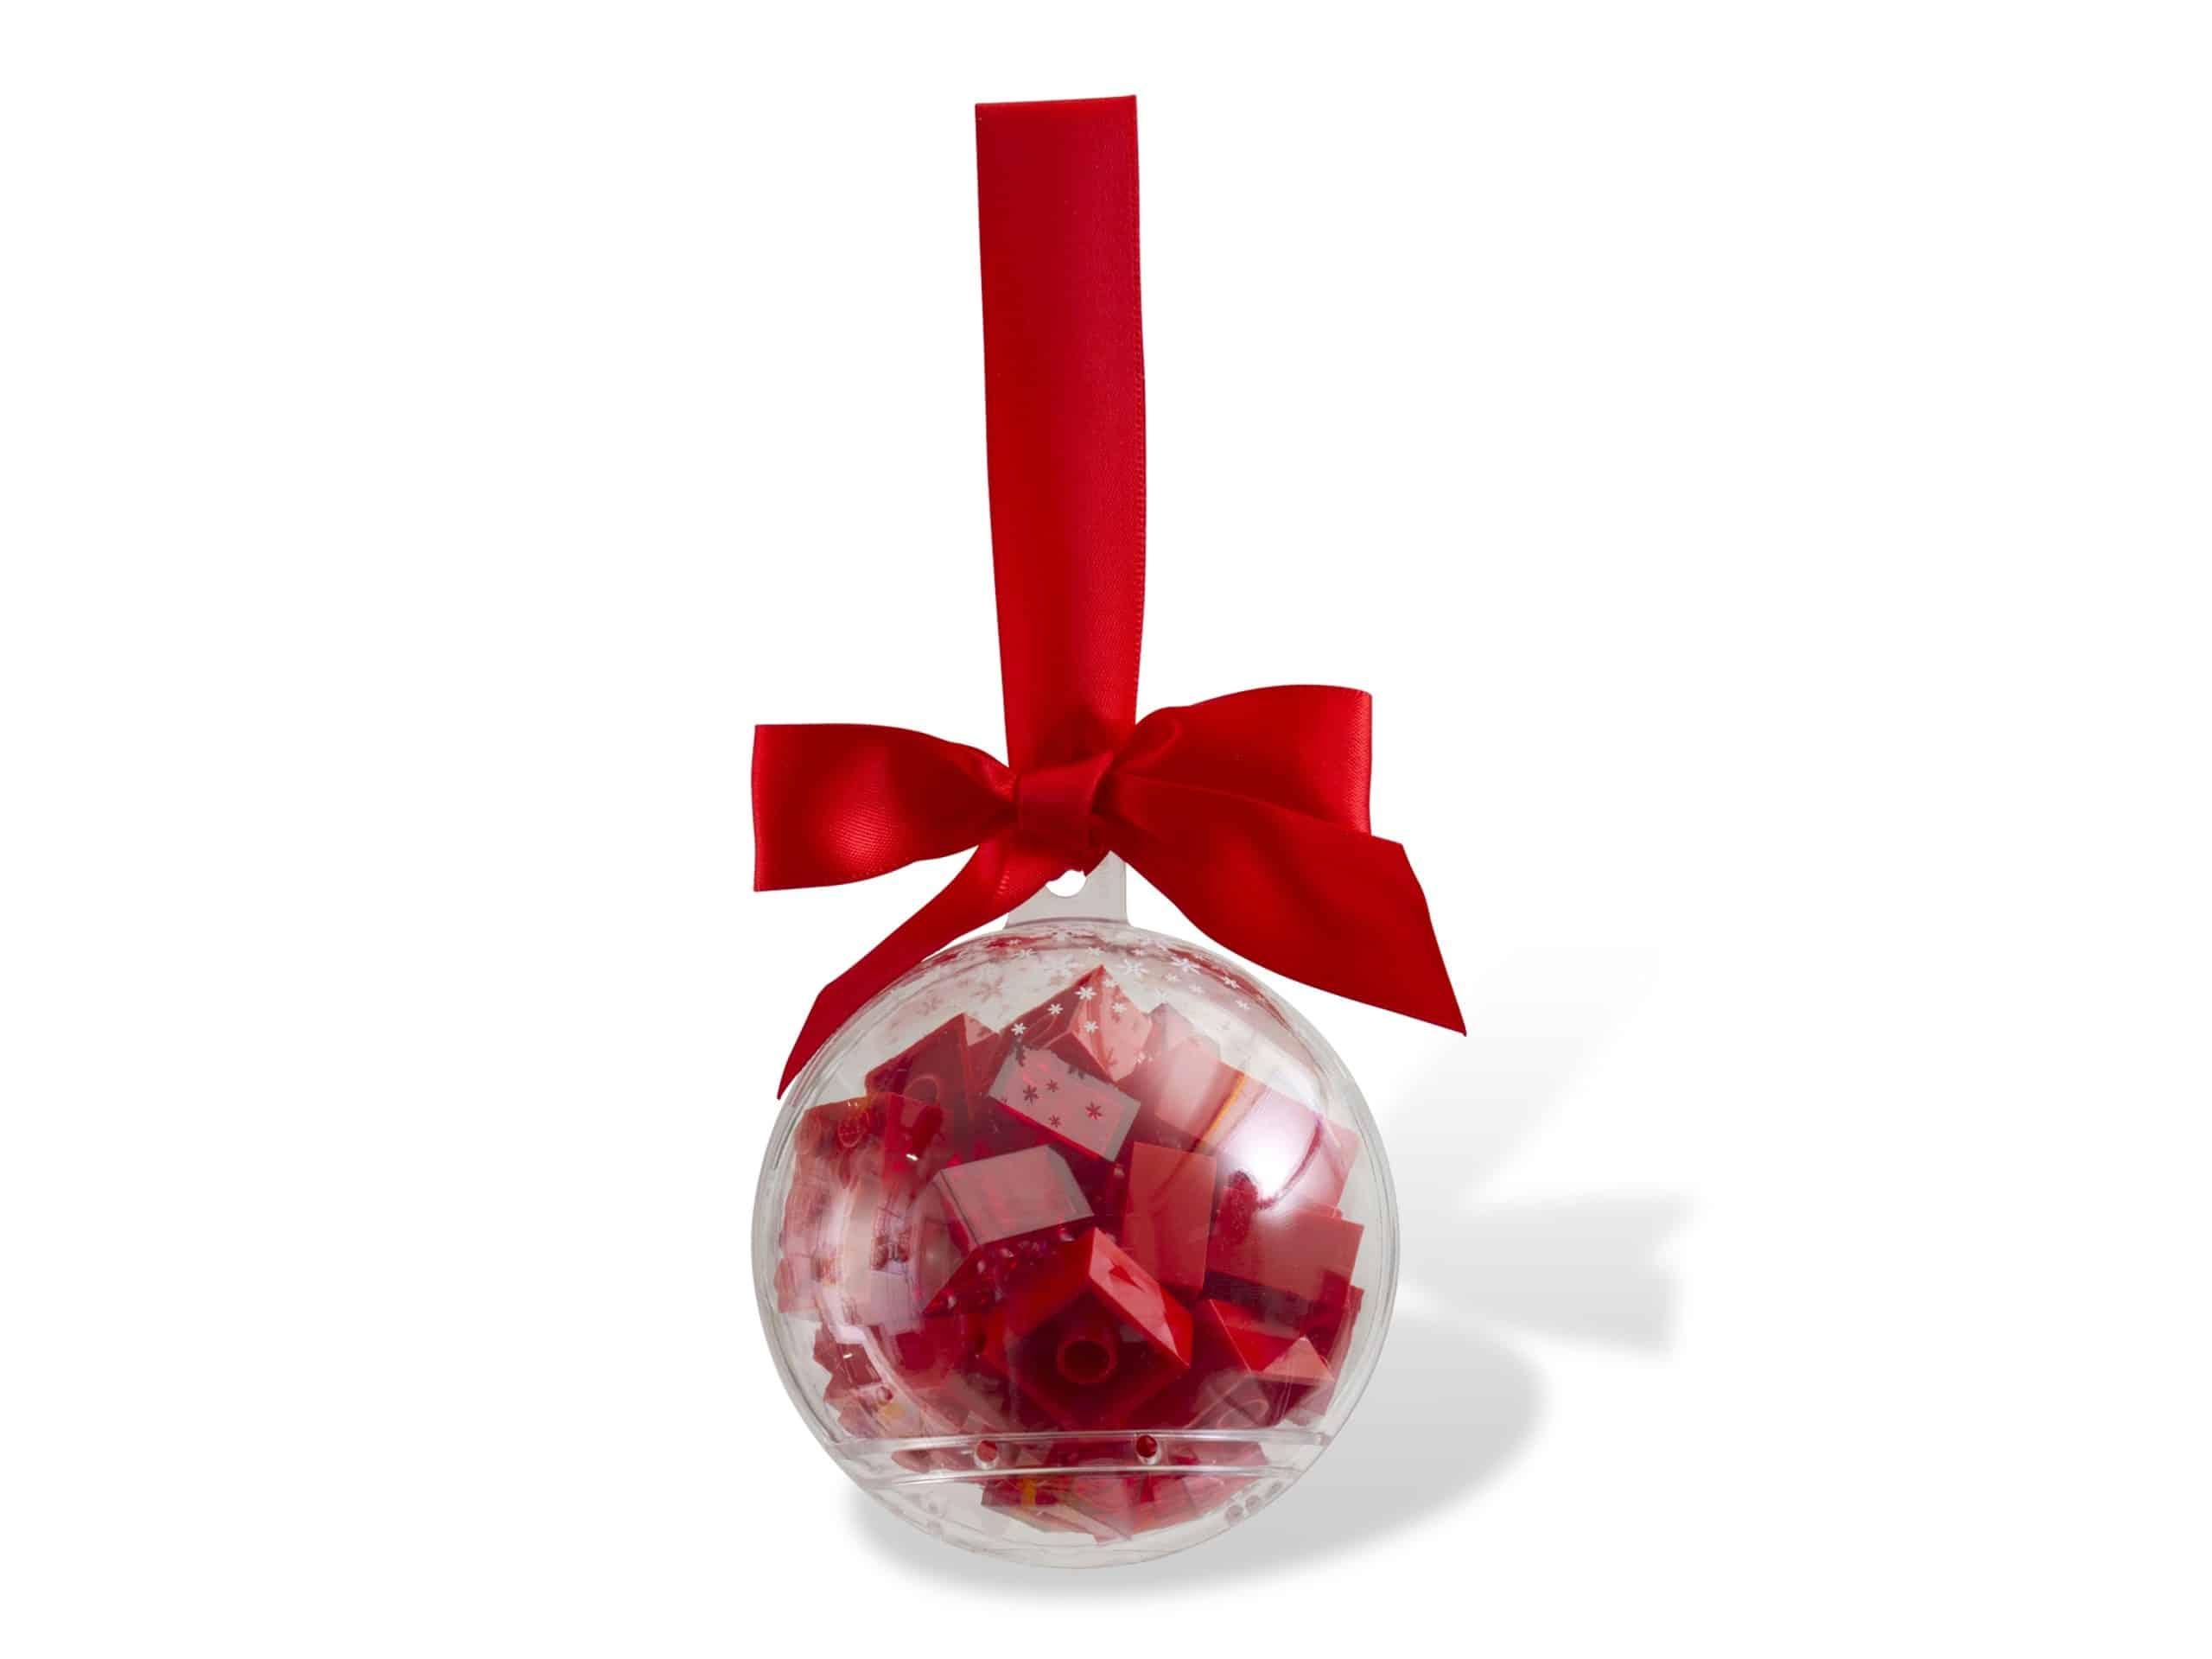 lego 853344 julepynt med rode klodser scaled